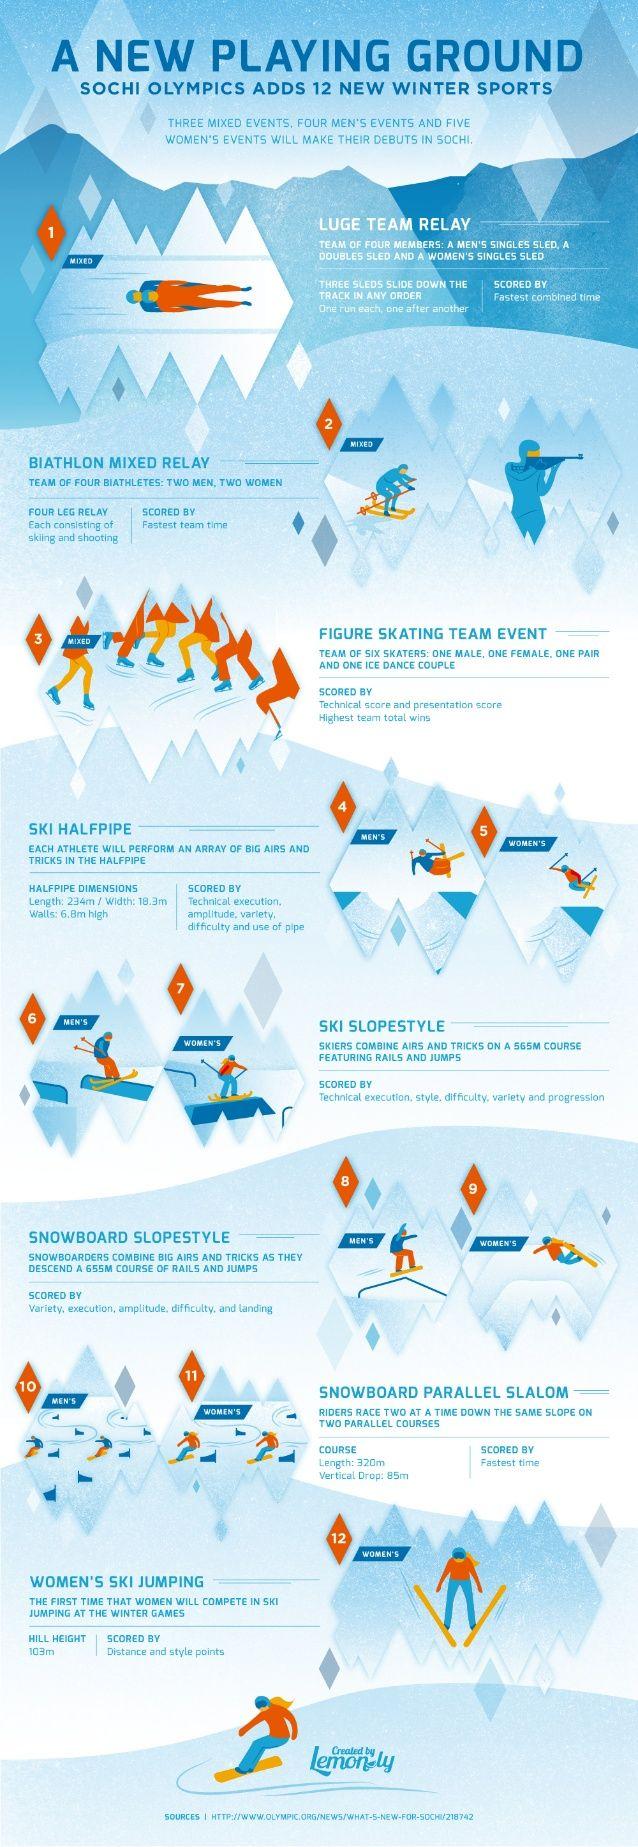 New Olympic Sports - Sochi 2014 Infographic by Lemonly via slideshare